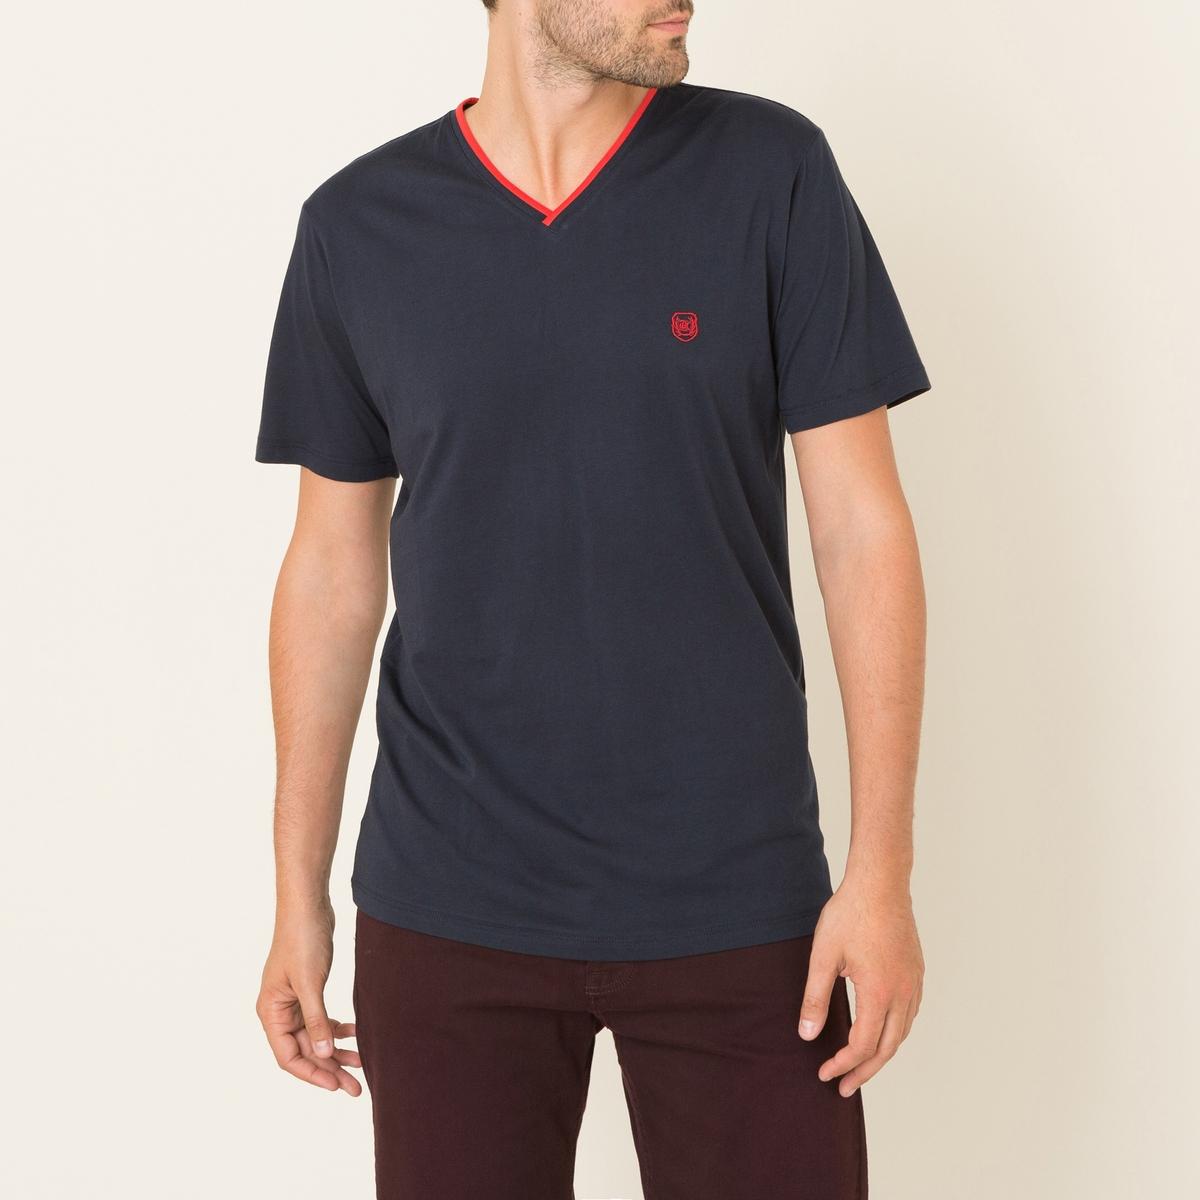 Однотонная футболкаСостав и описание Материал : джерси, 100% хлопкаРубчик 95% хлопка, 5% эластана Марка : THE KOOPLES SPORT<br><br>Цвет: темно-синий